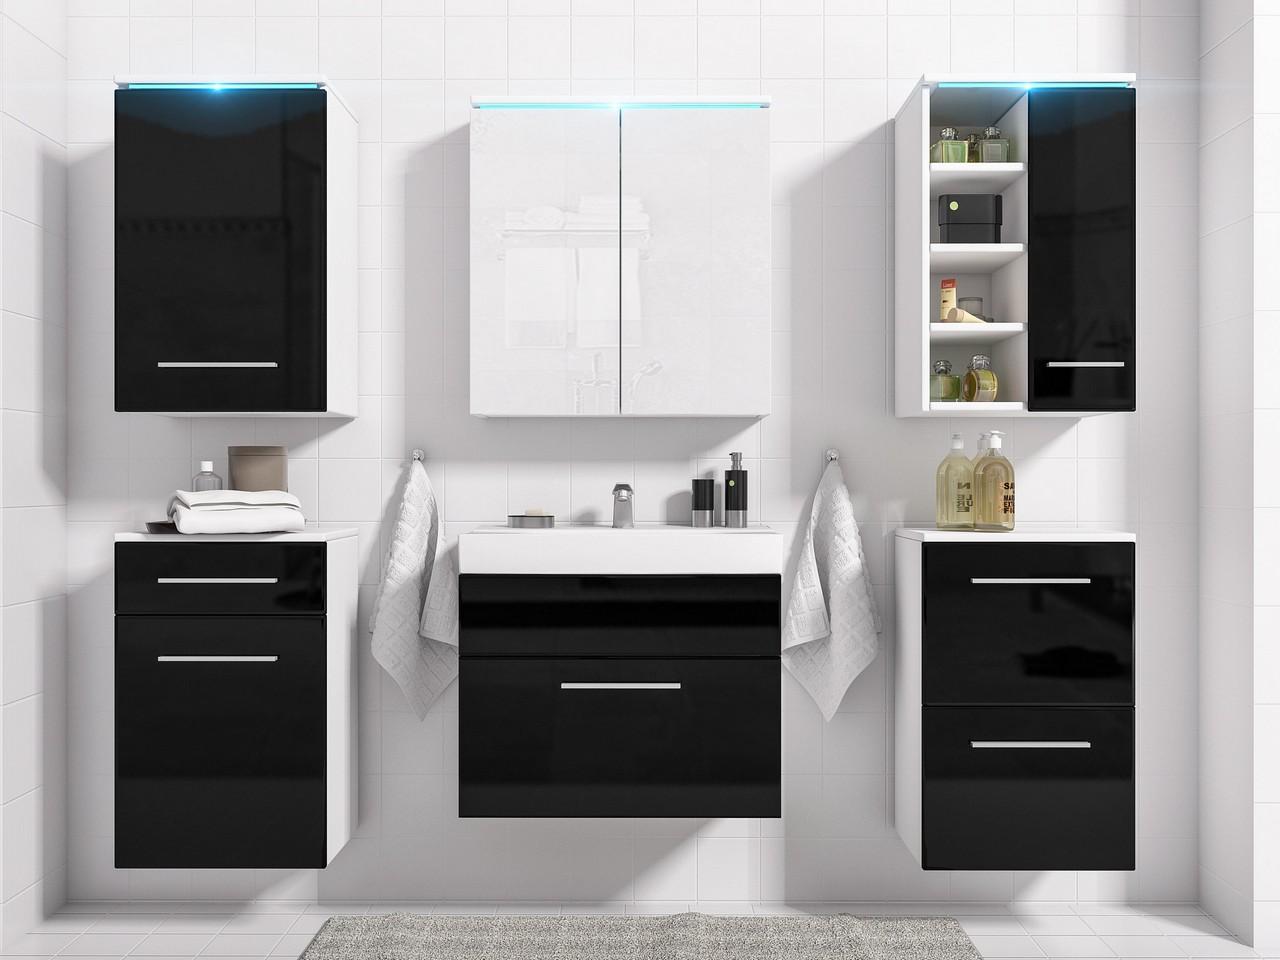 MEBLINE Koupelna MEGI bílý / černý lesk